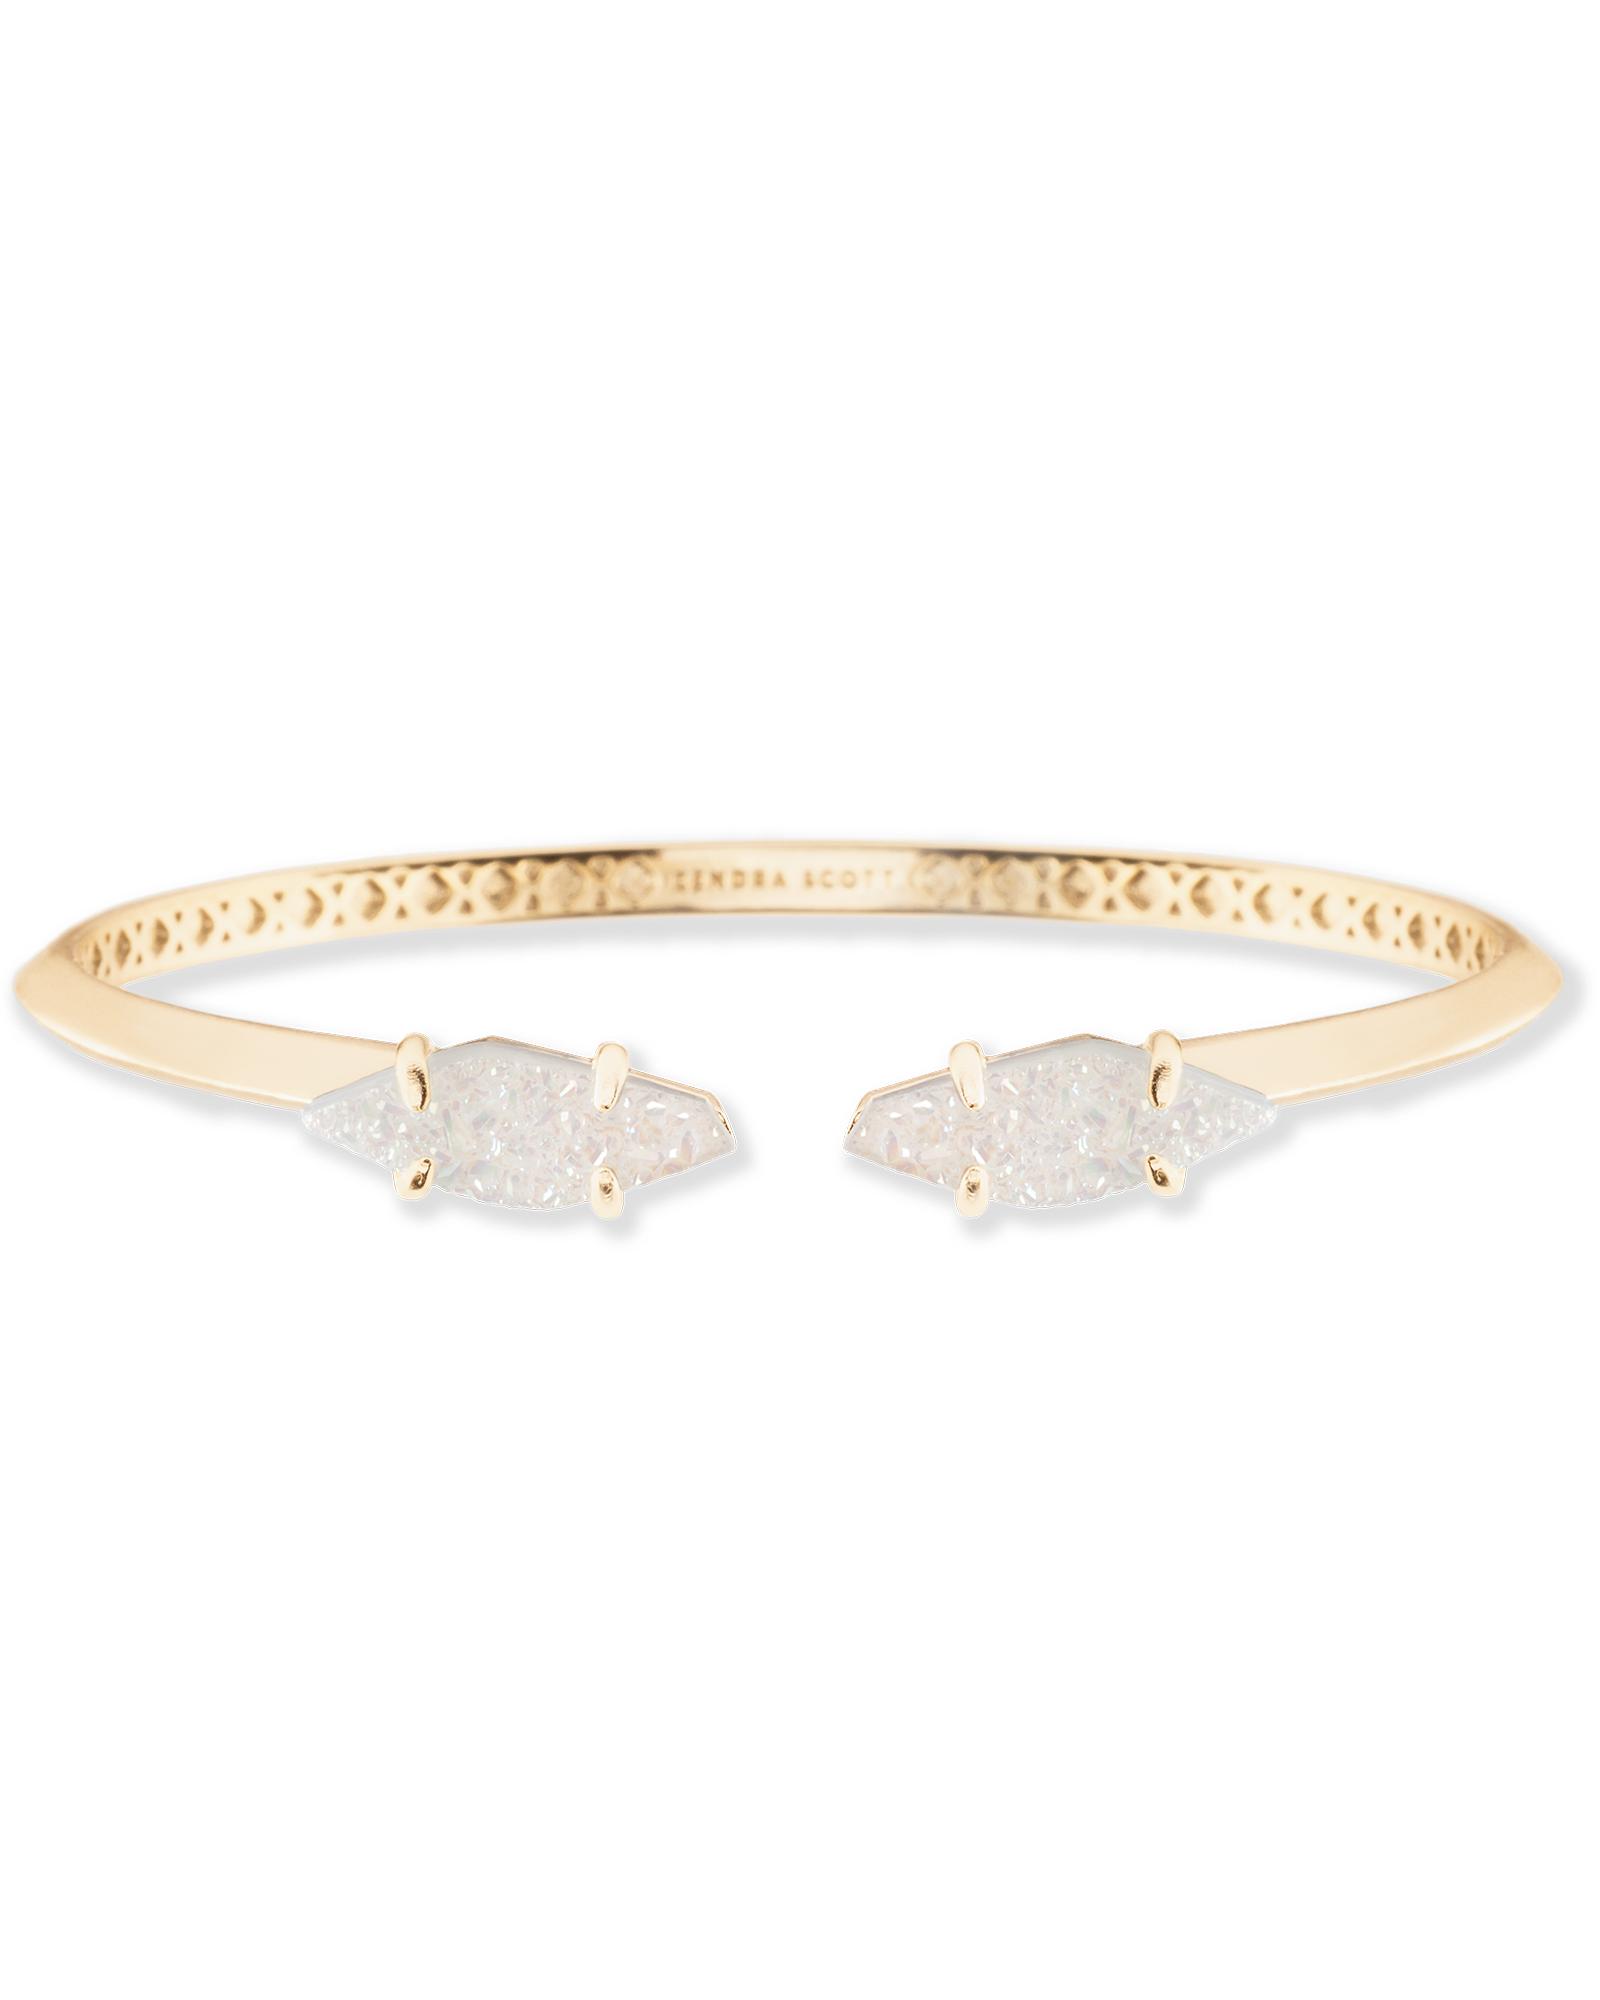 Bianca Cuff Bracelet in Iridescent Drusy - Kendra Scott Jewelry